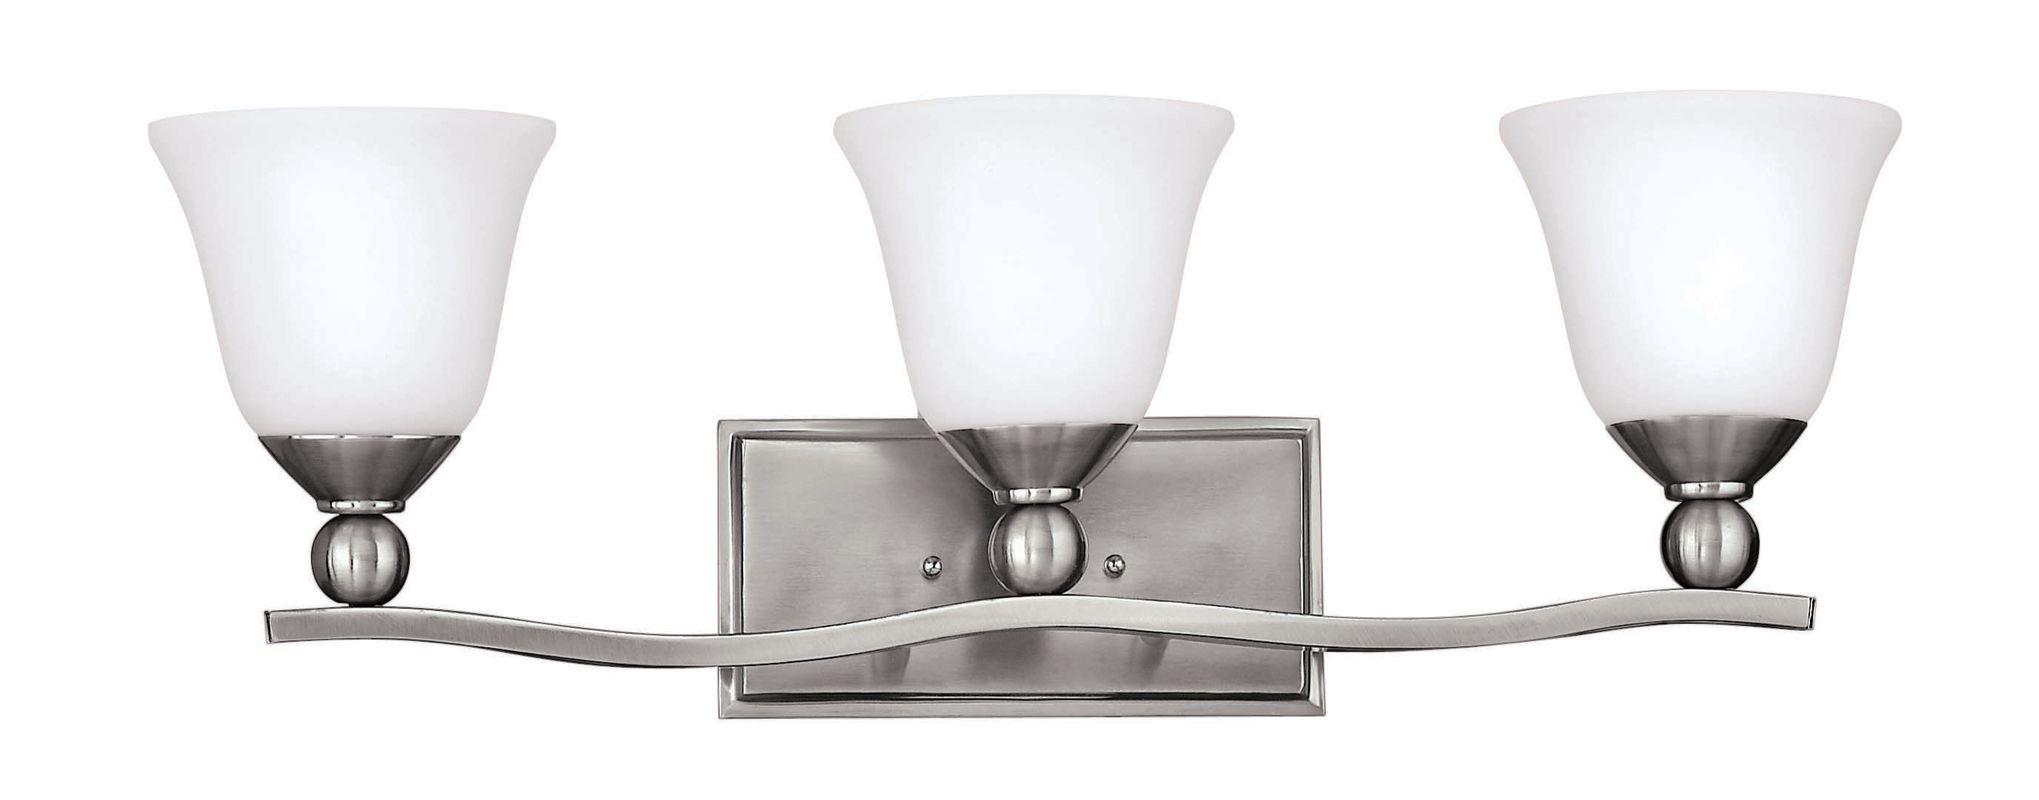 Hinkley Lighting 5893bn Brushed Nickel 3 Light 26 Width Bathroom Vanity Light From The Bolla